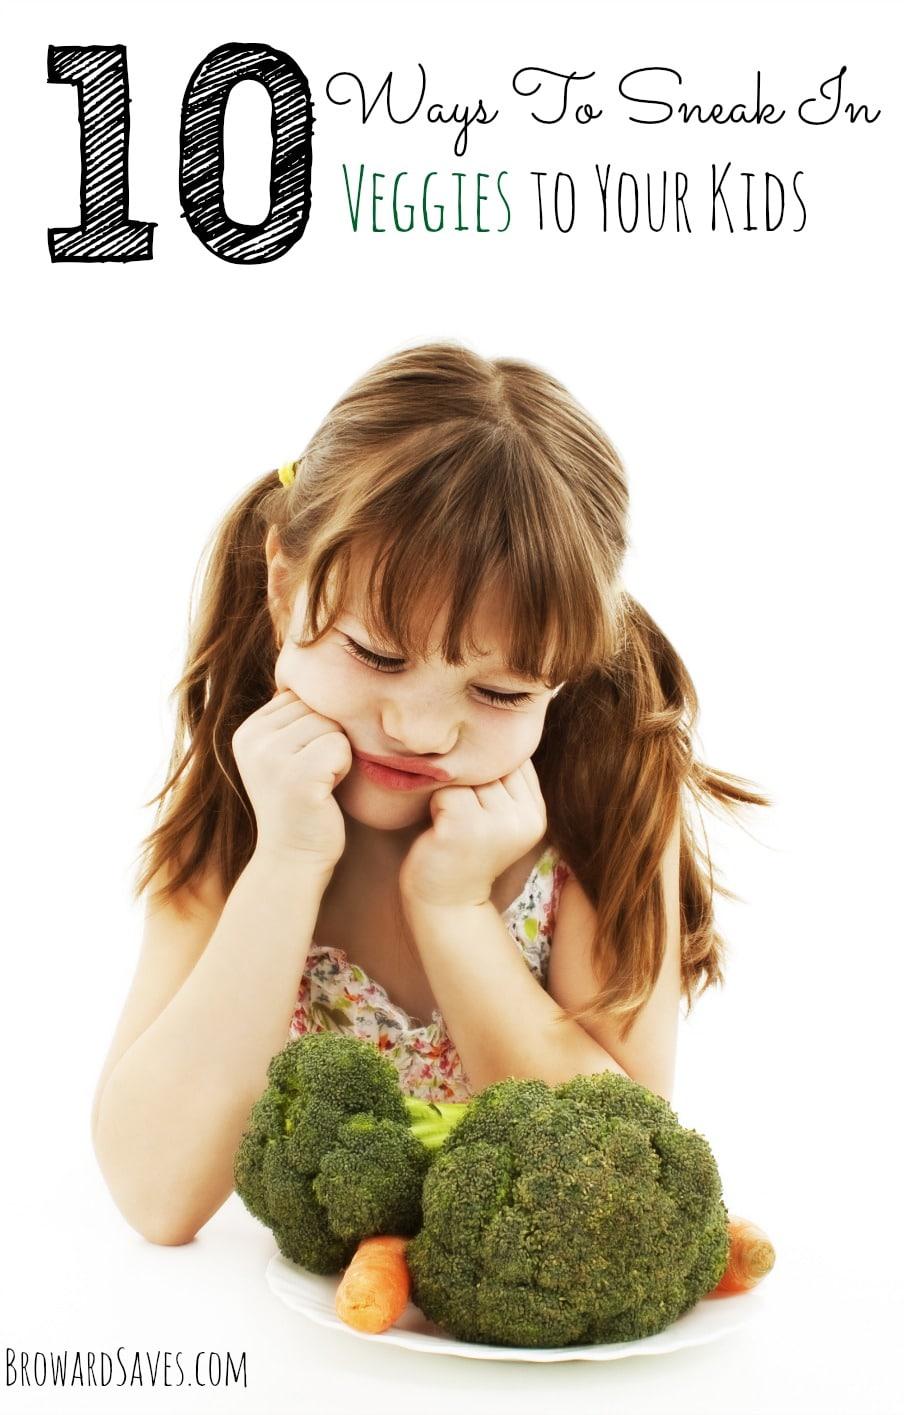 10-ways-to-sneak-in-veggies-to-your-kids